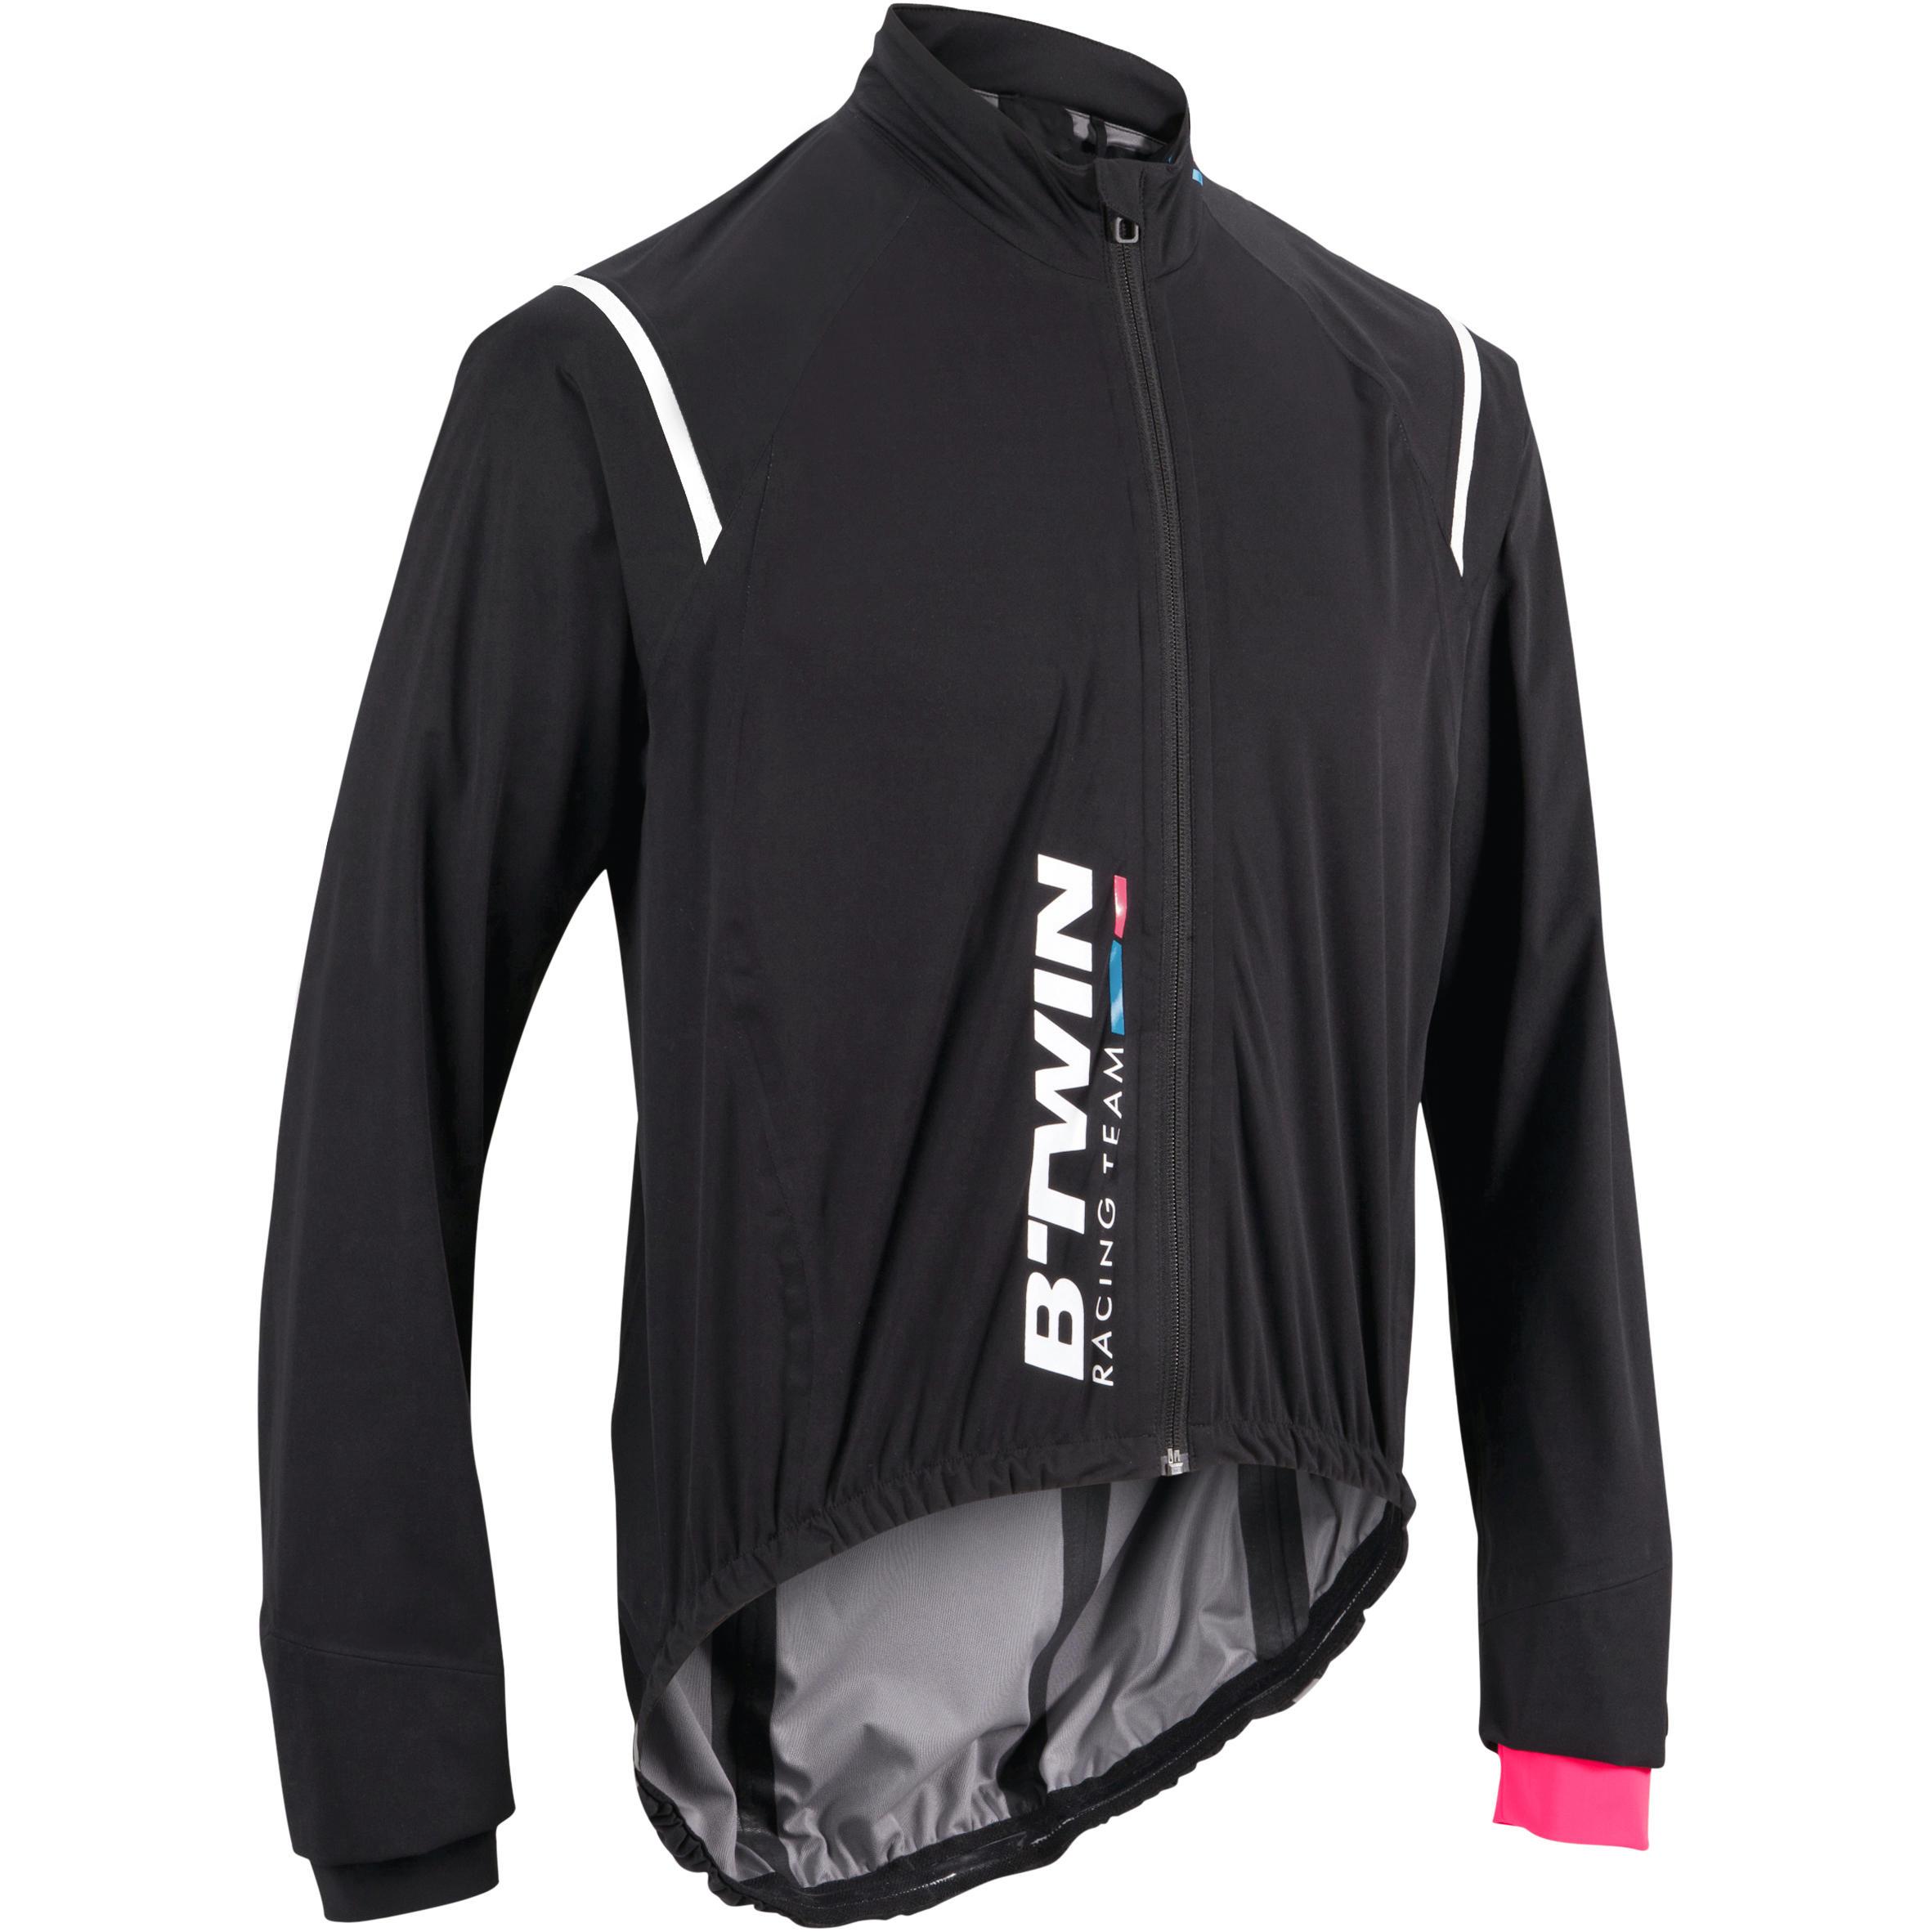 900 Cycling Rainproof Jacket - Black